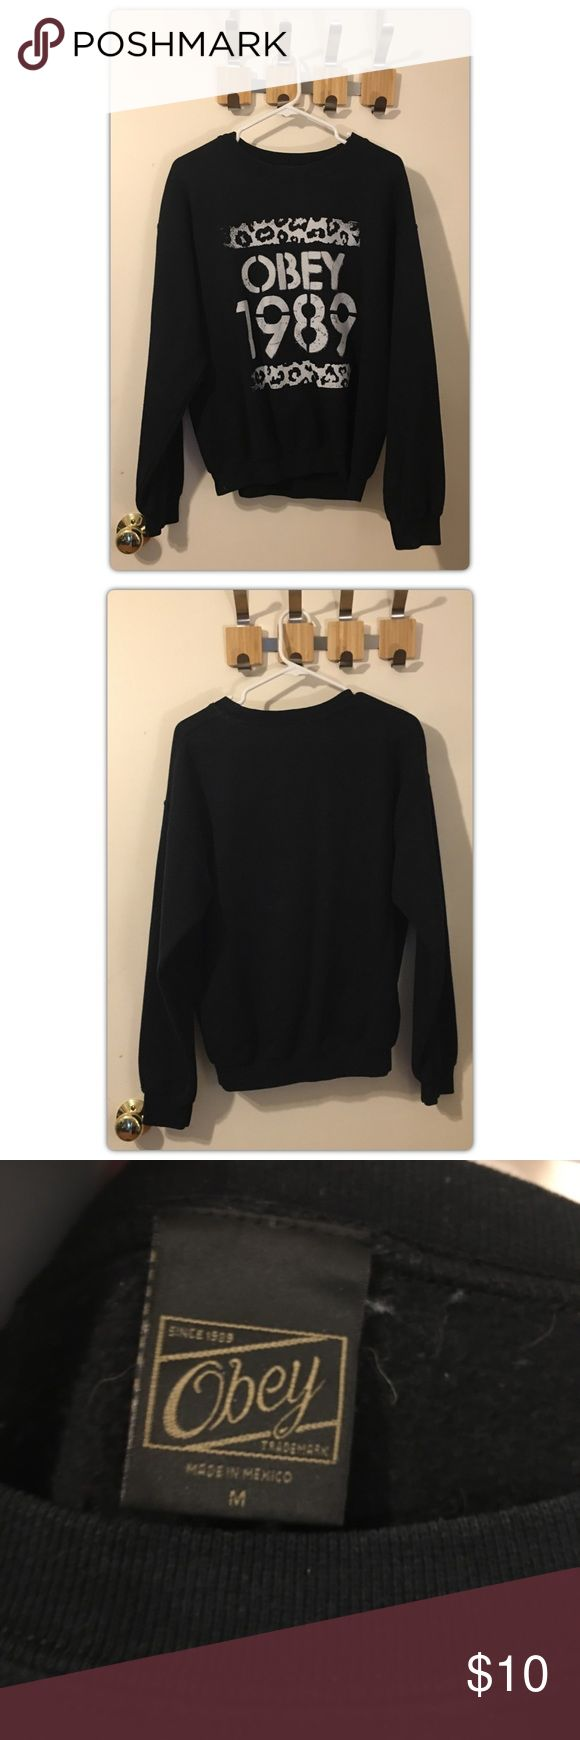 OBEY Sweatshirt OBEY Sweatshirt. Black with grey print. Leopard print. Cozy and warm. Size Medium. Obey Tops Sweatshirts & Hoodies